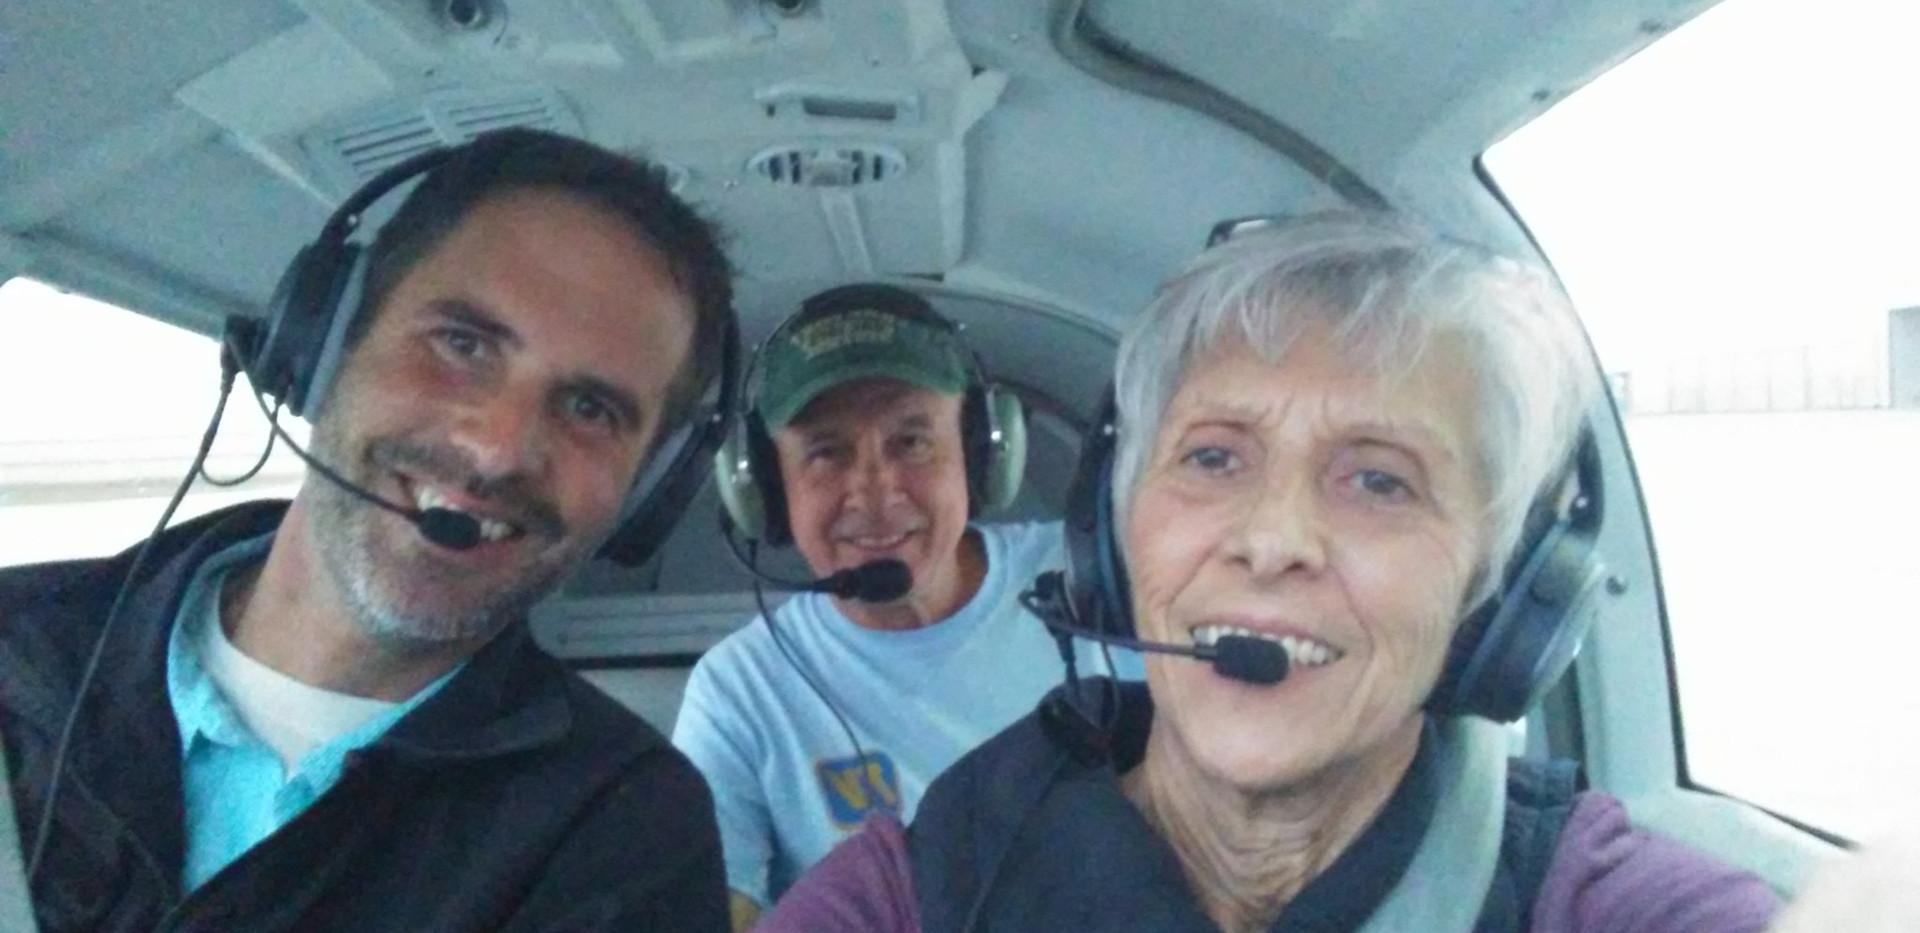 Kathy with hubby Bobby and son Dayton, gyroplane pilot & CFI